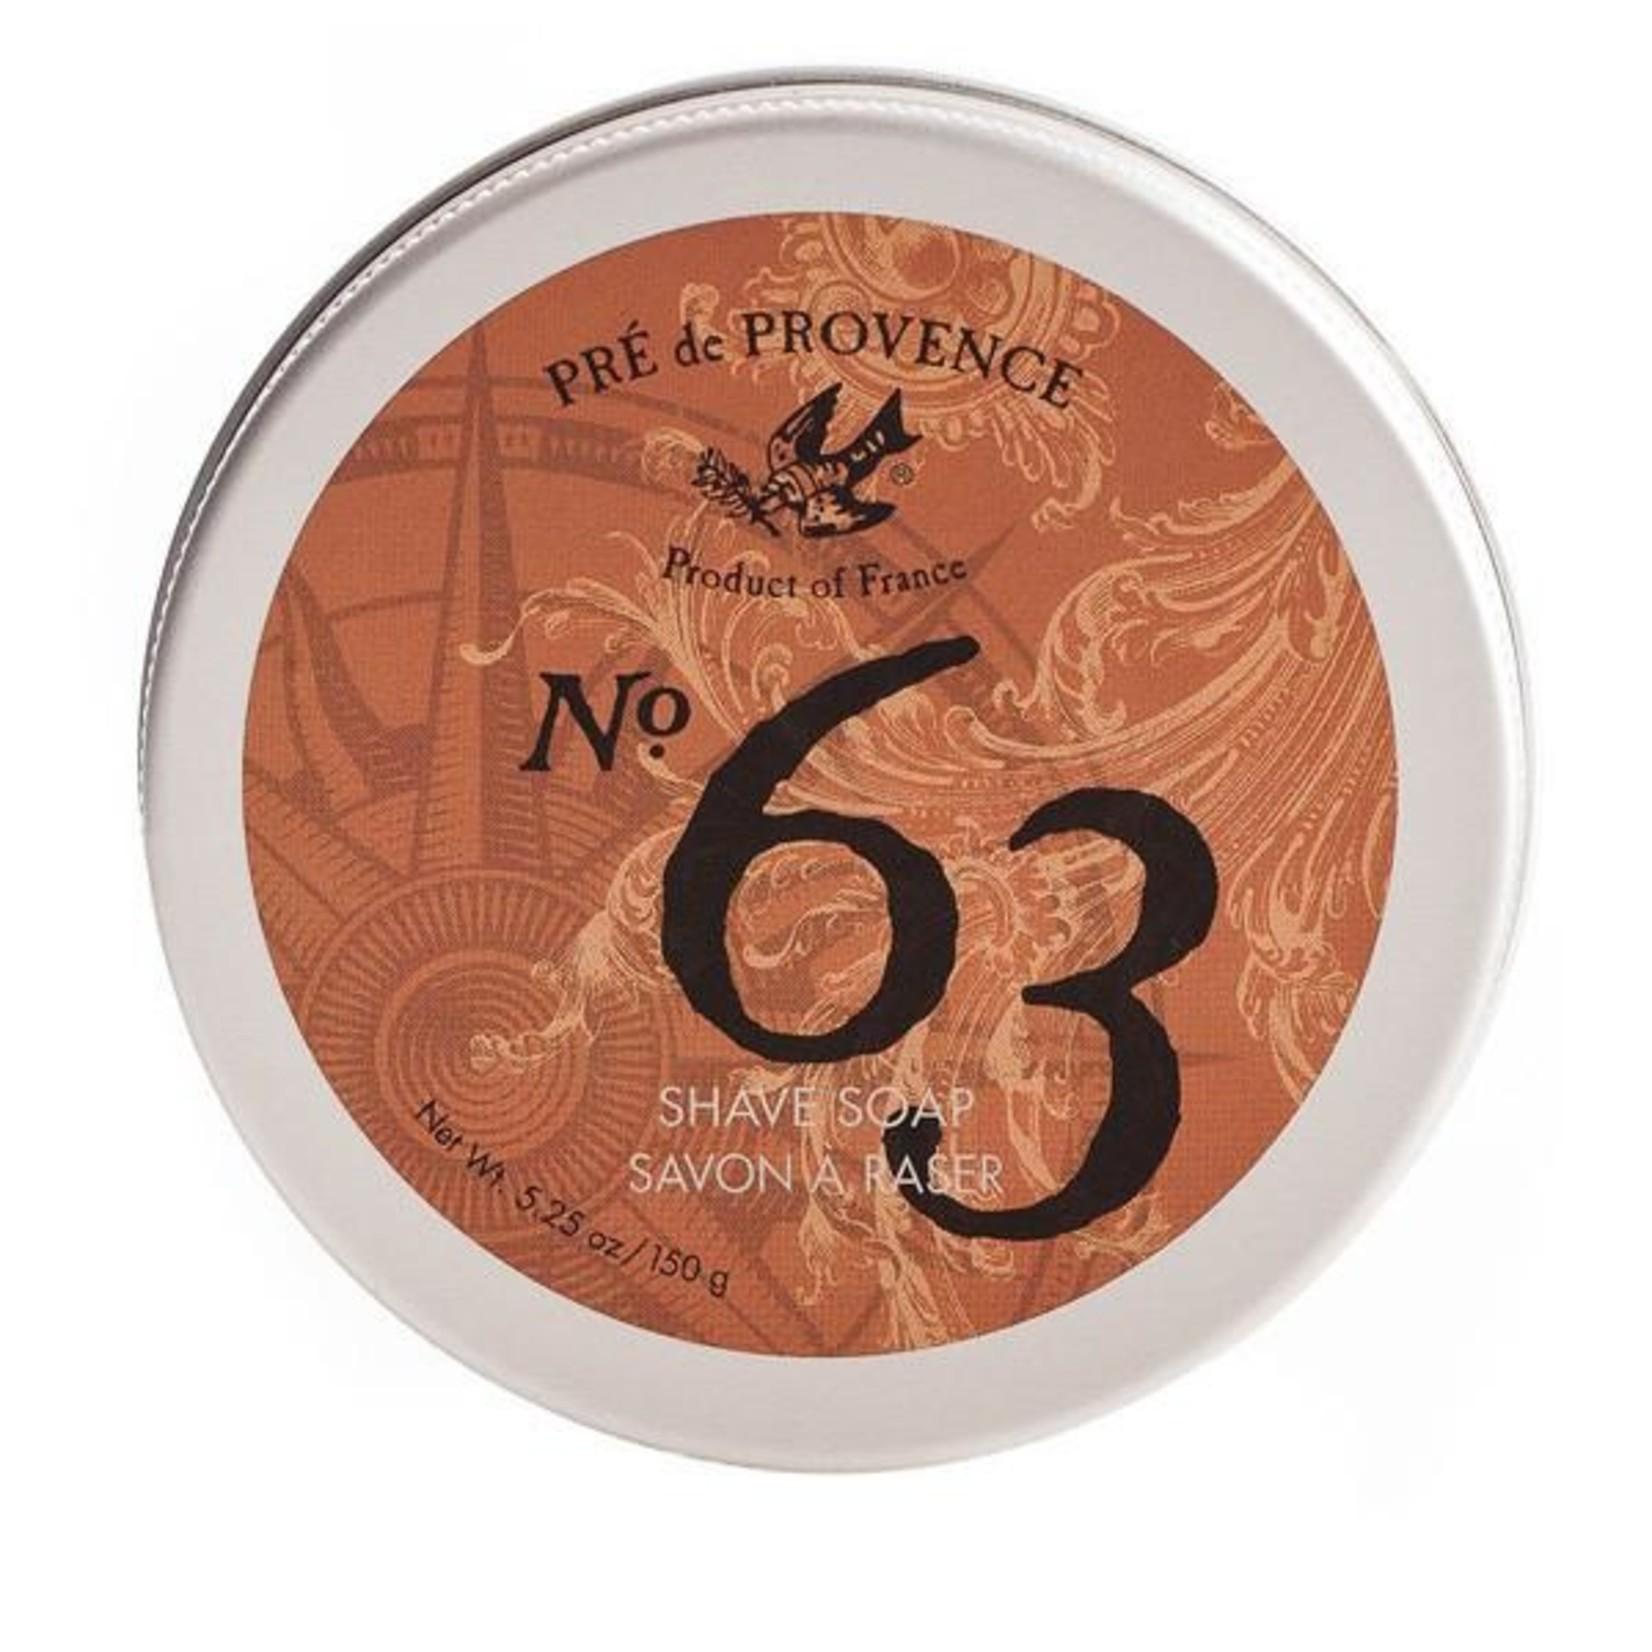 Pre de Provence No. 63 Shave Soap Tin